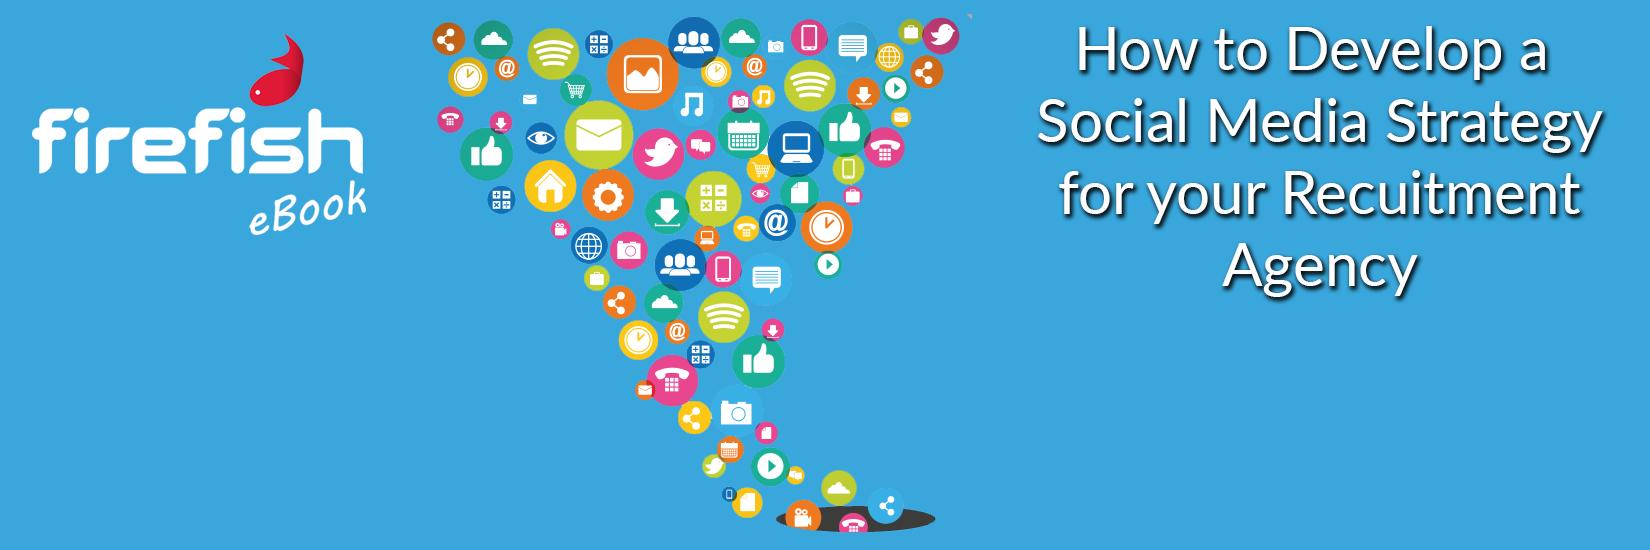 Social_Media_for_Recruitment_Agencies_Strategy.png